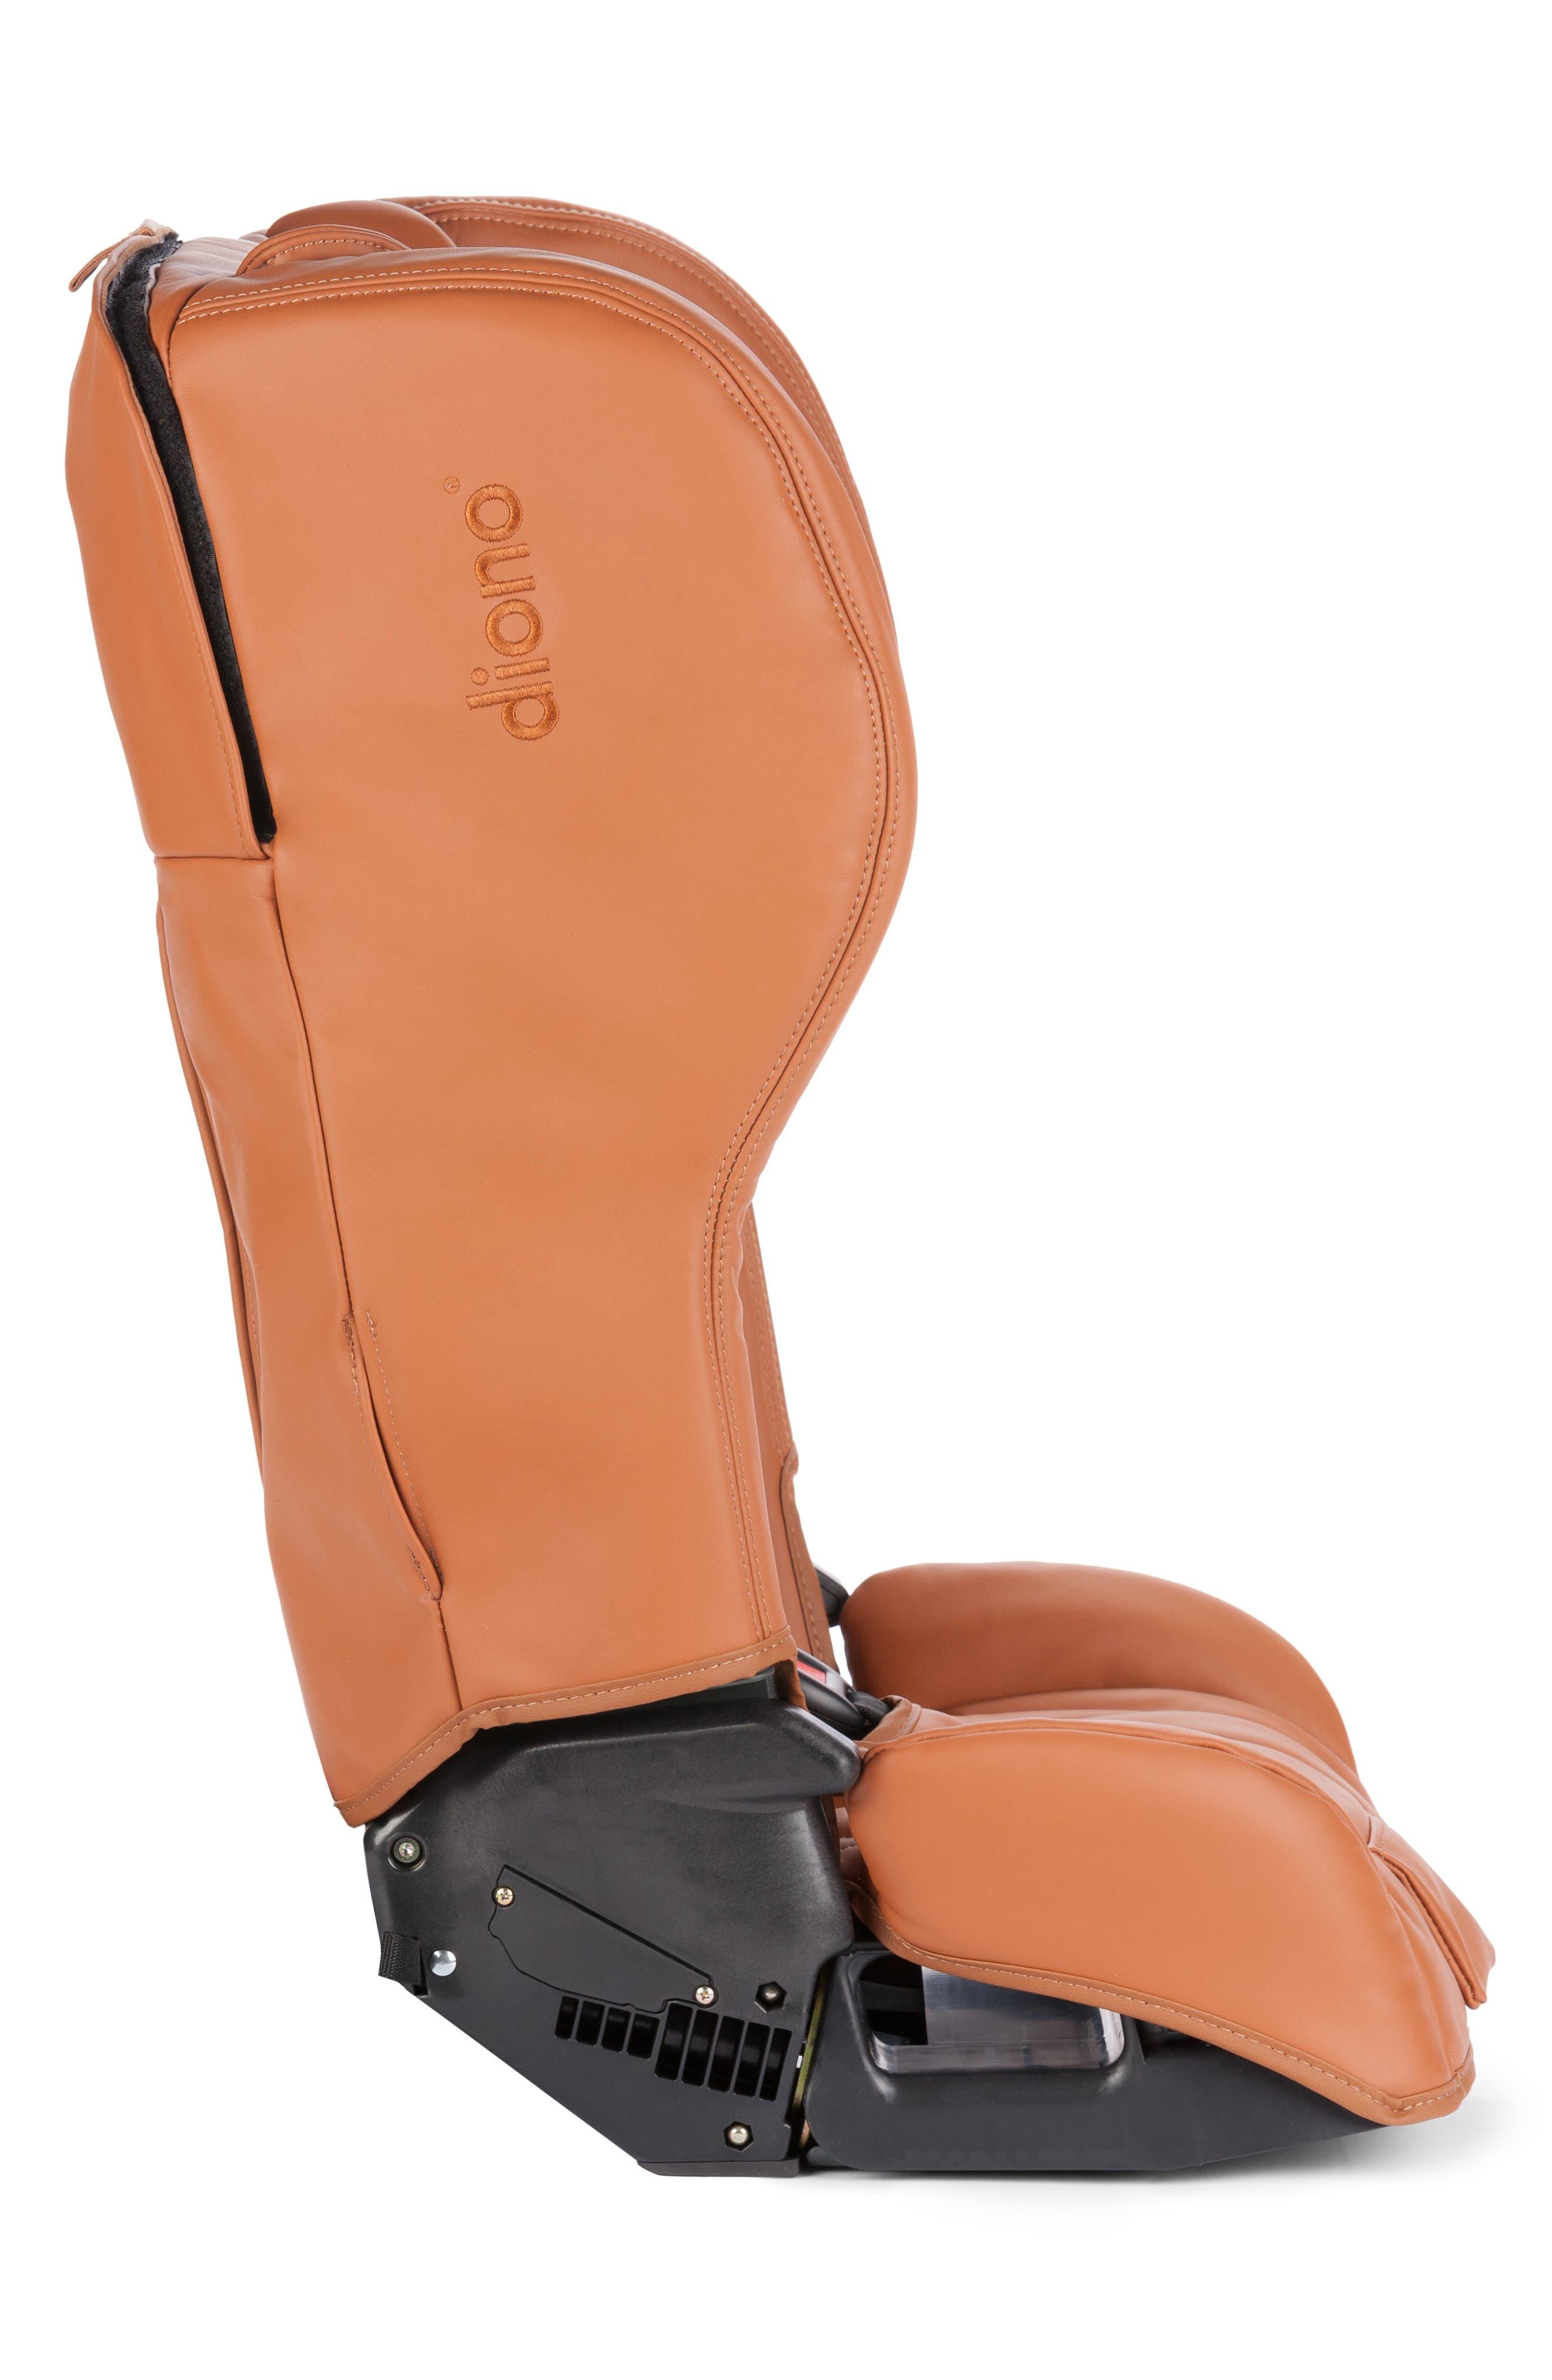 Infant Diono Rainier 2 Axt Prestige Car Seat